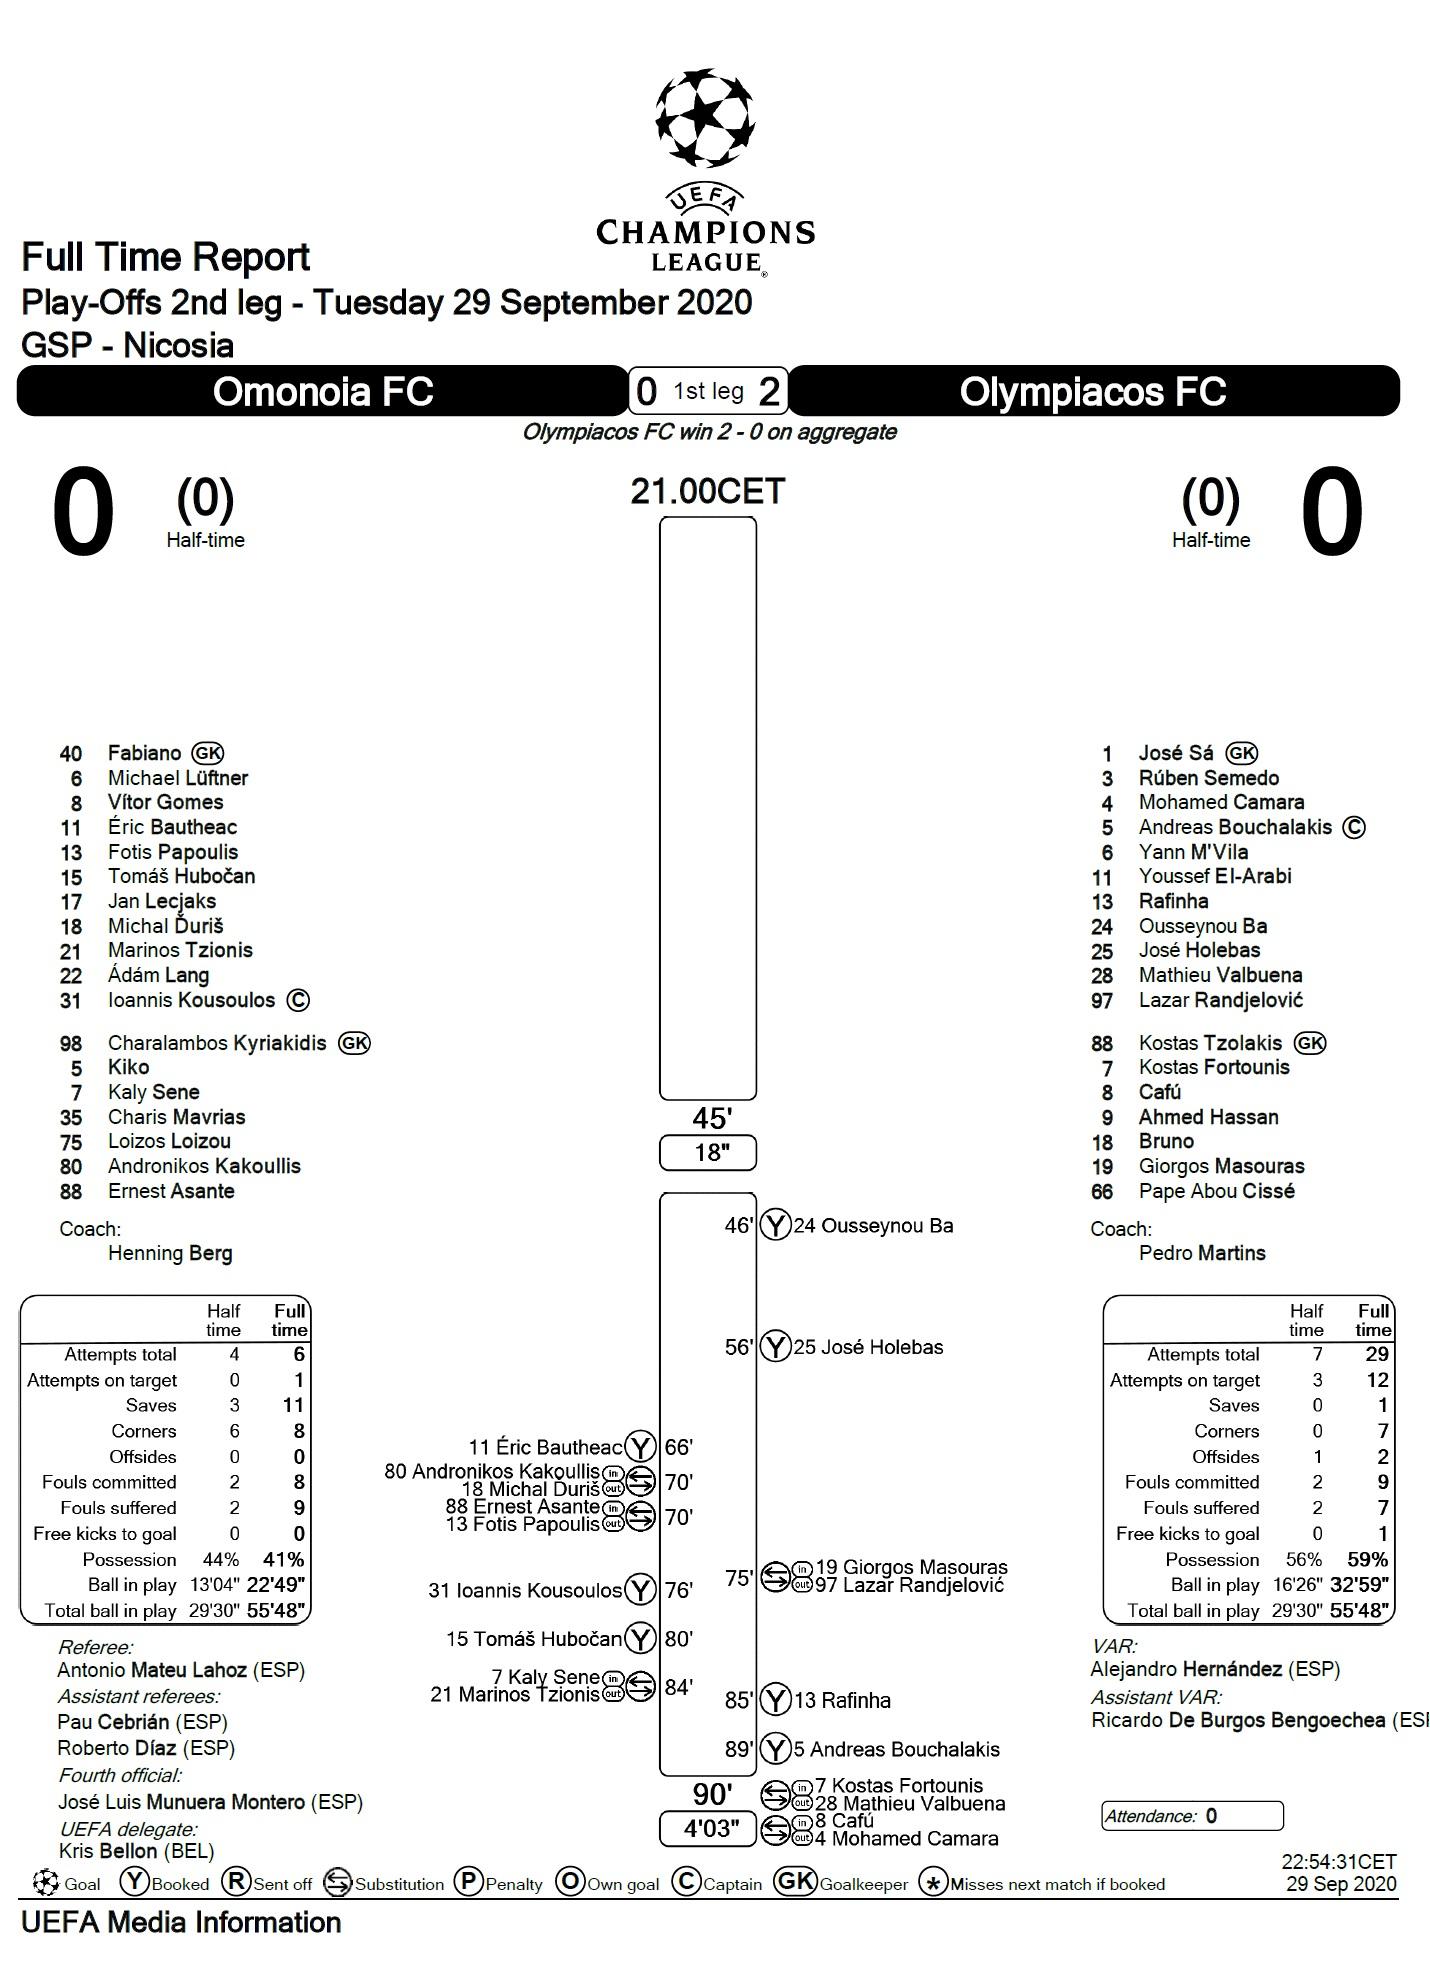 Омония (Кипр) - Олимпиакос (Греция) 0:0